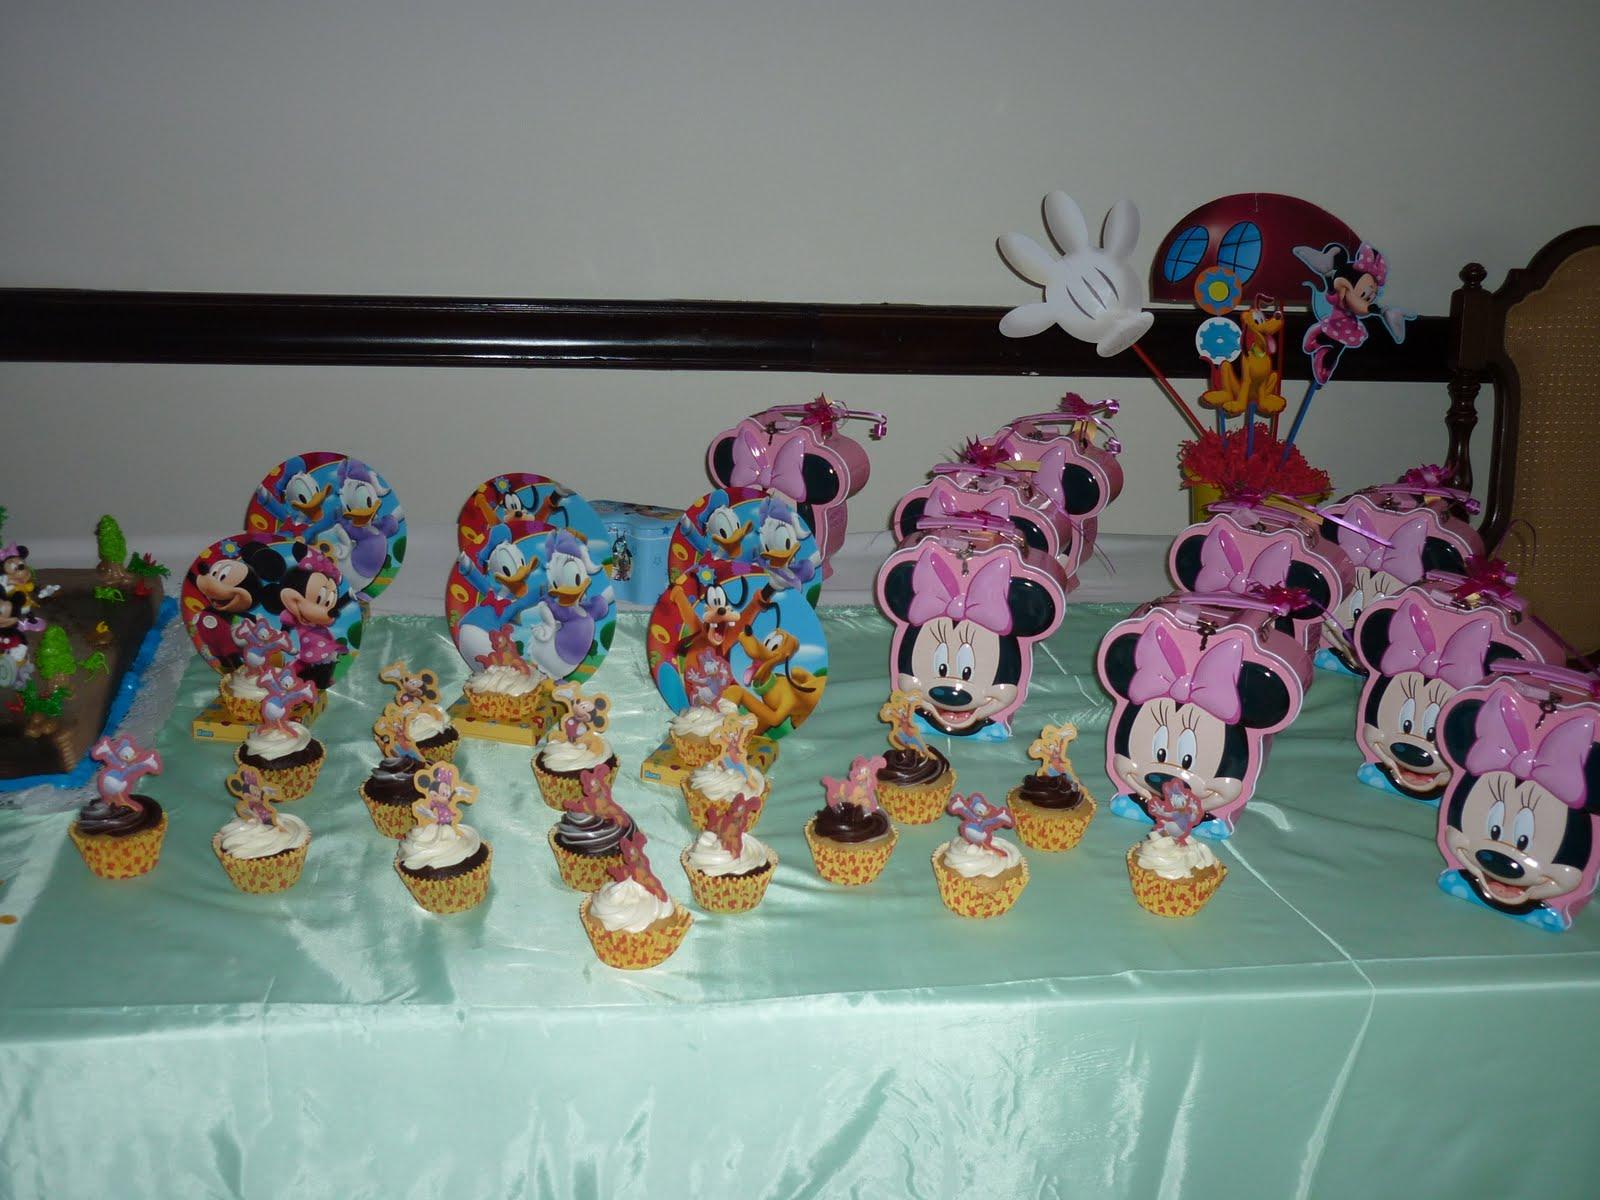 Memorias en papel decoraci n de cumplea os de mickey mouse for Decoracion de cumpleanos